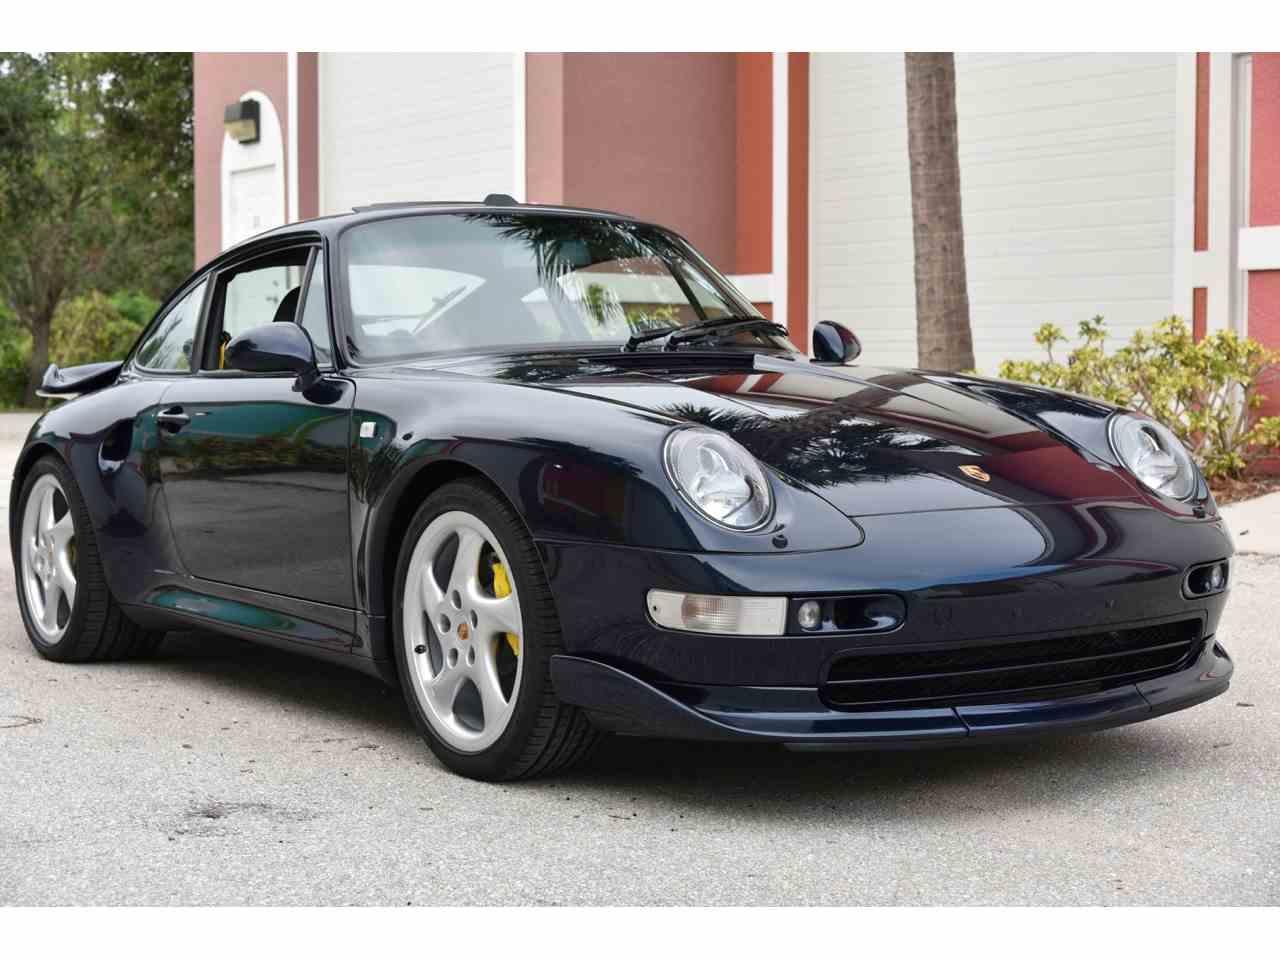 Classic Porsche for Sale on ClassicCars.com